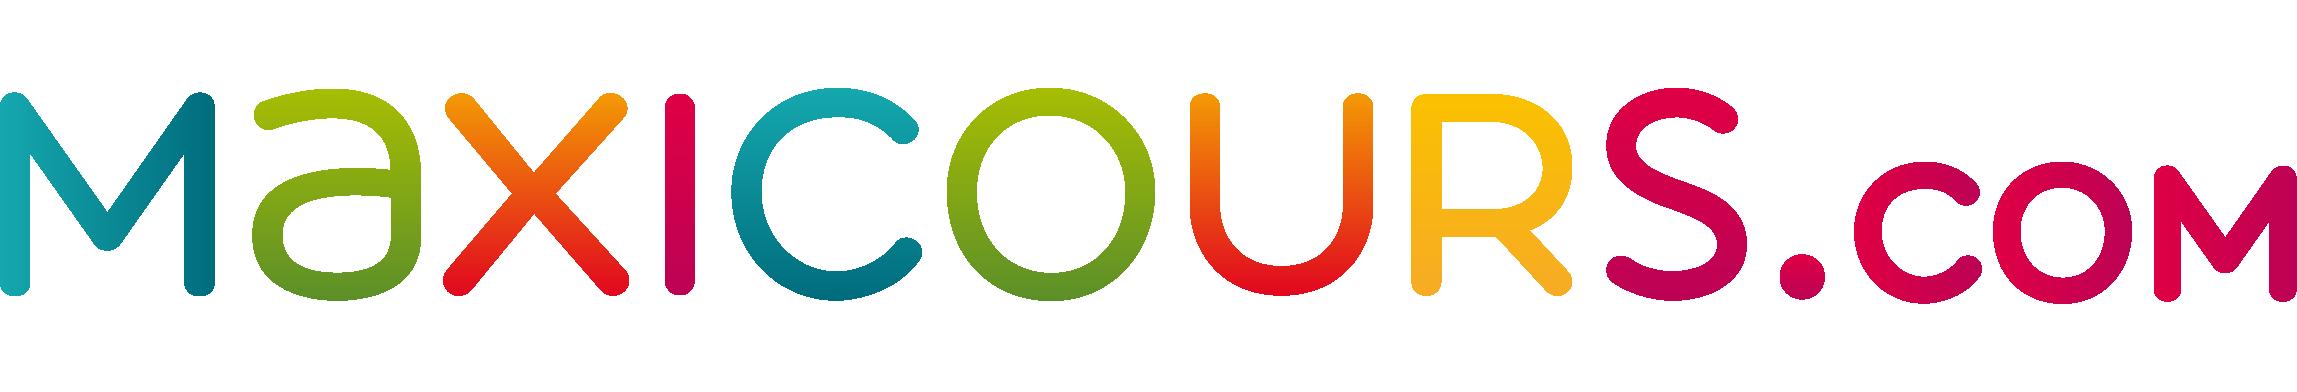 Maxicours Logo 2